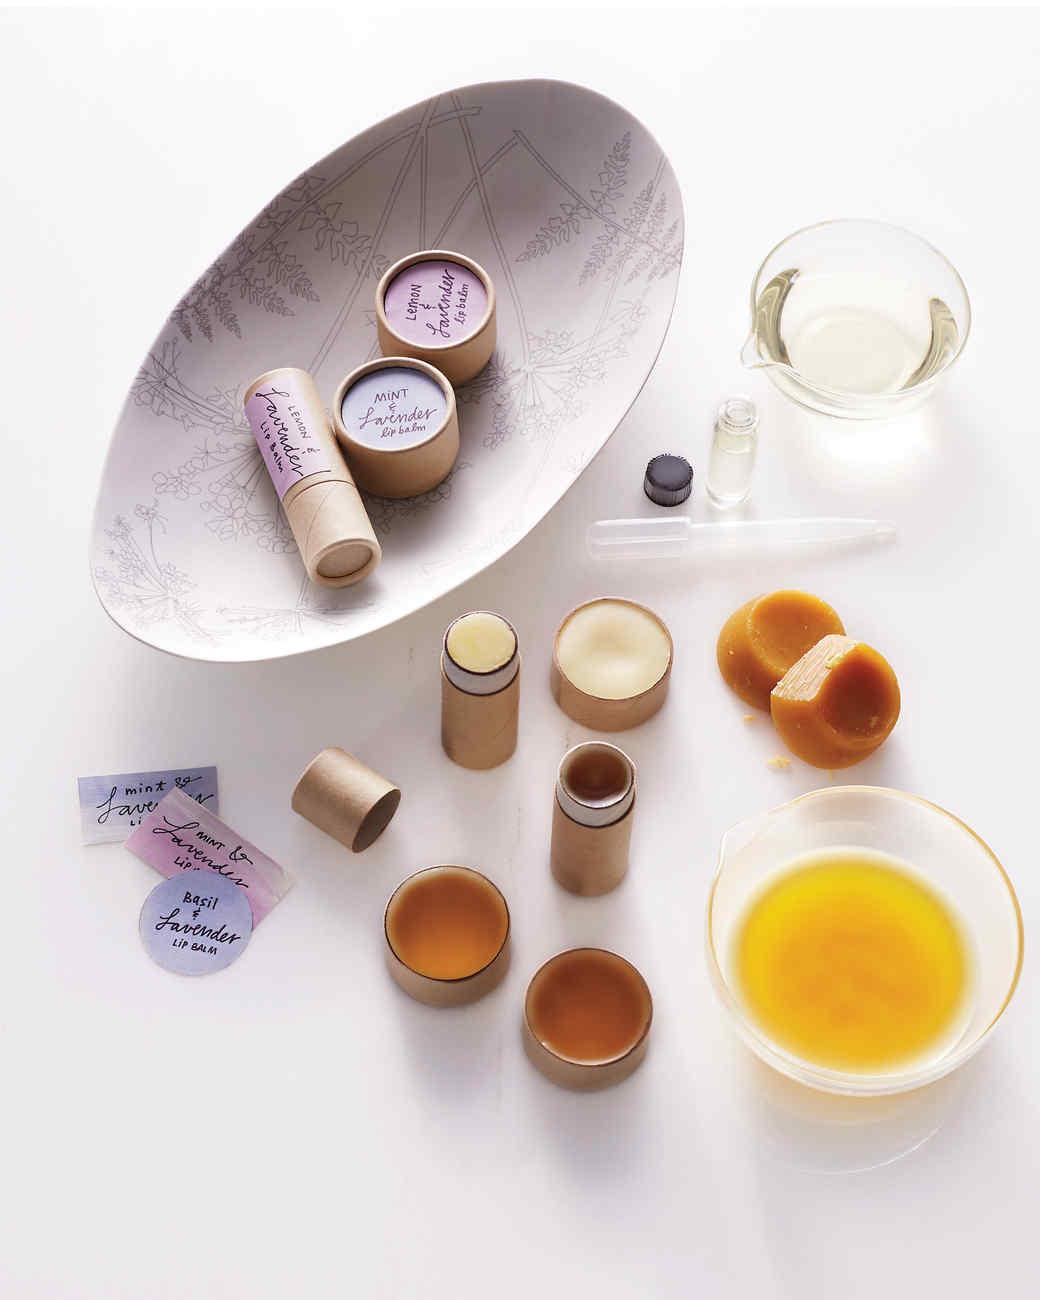 lavender-lip-balms-020-d111241.jpg